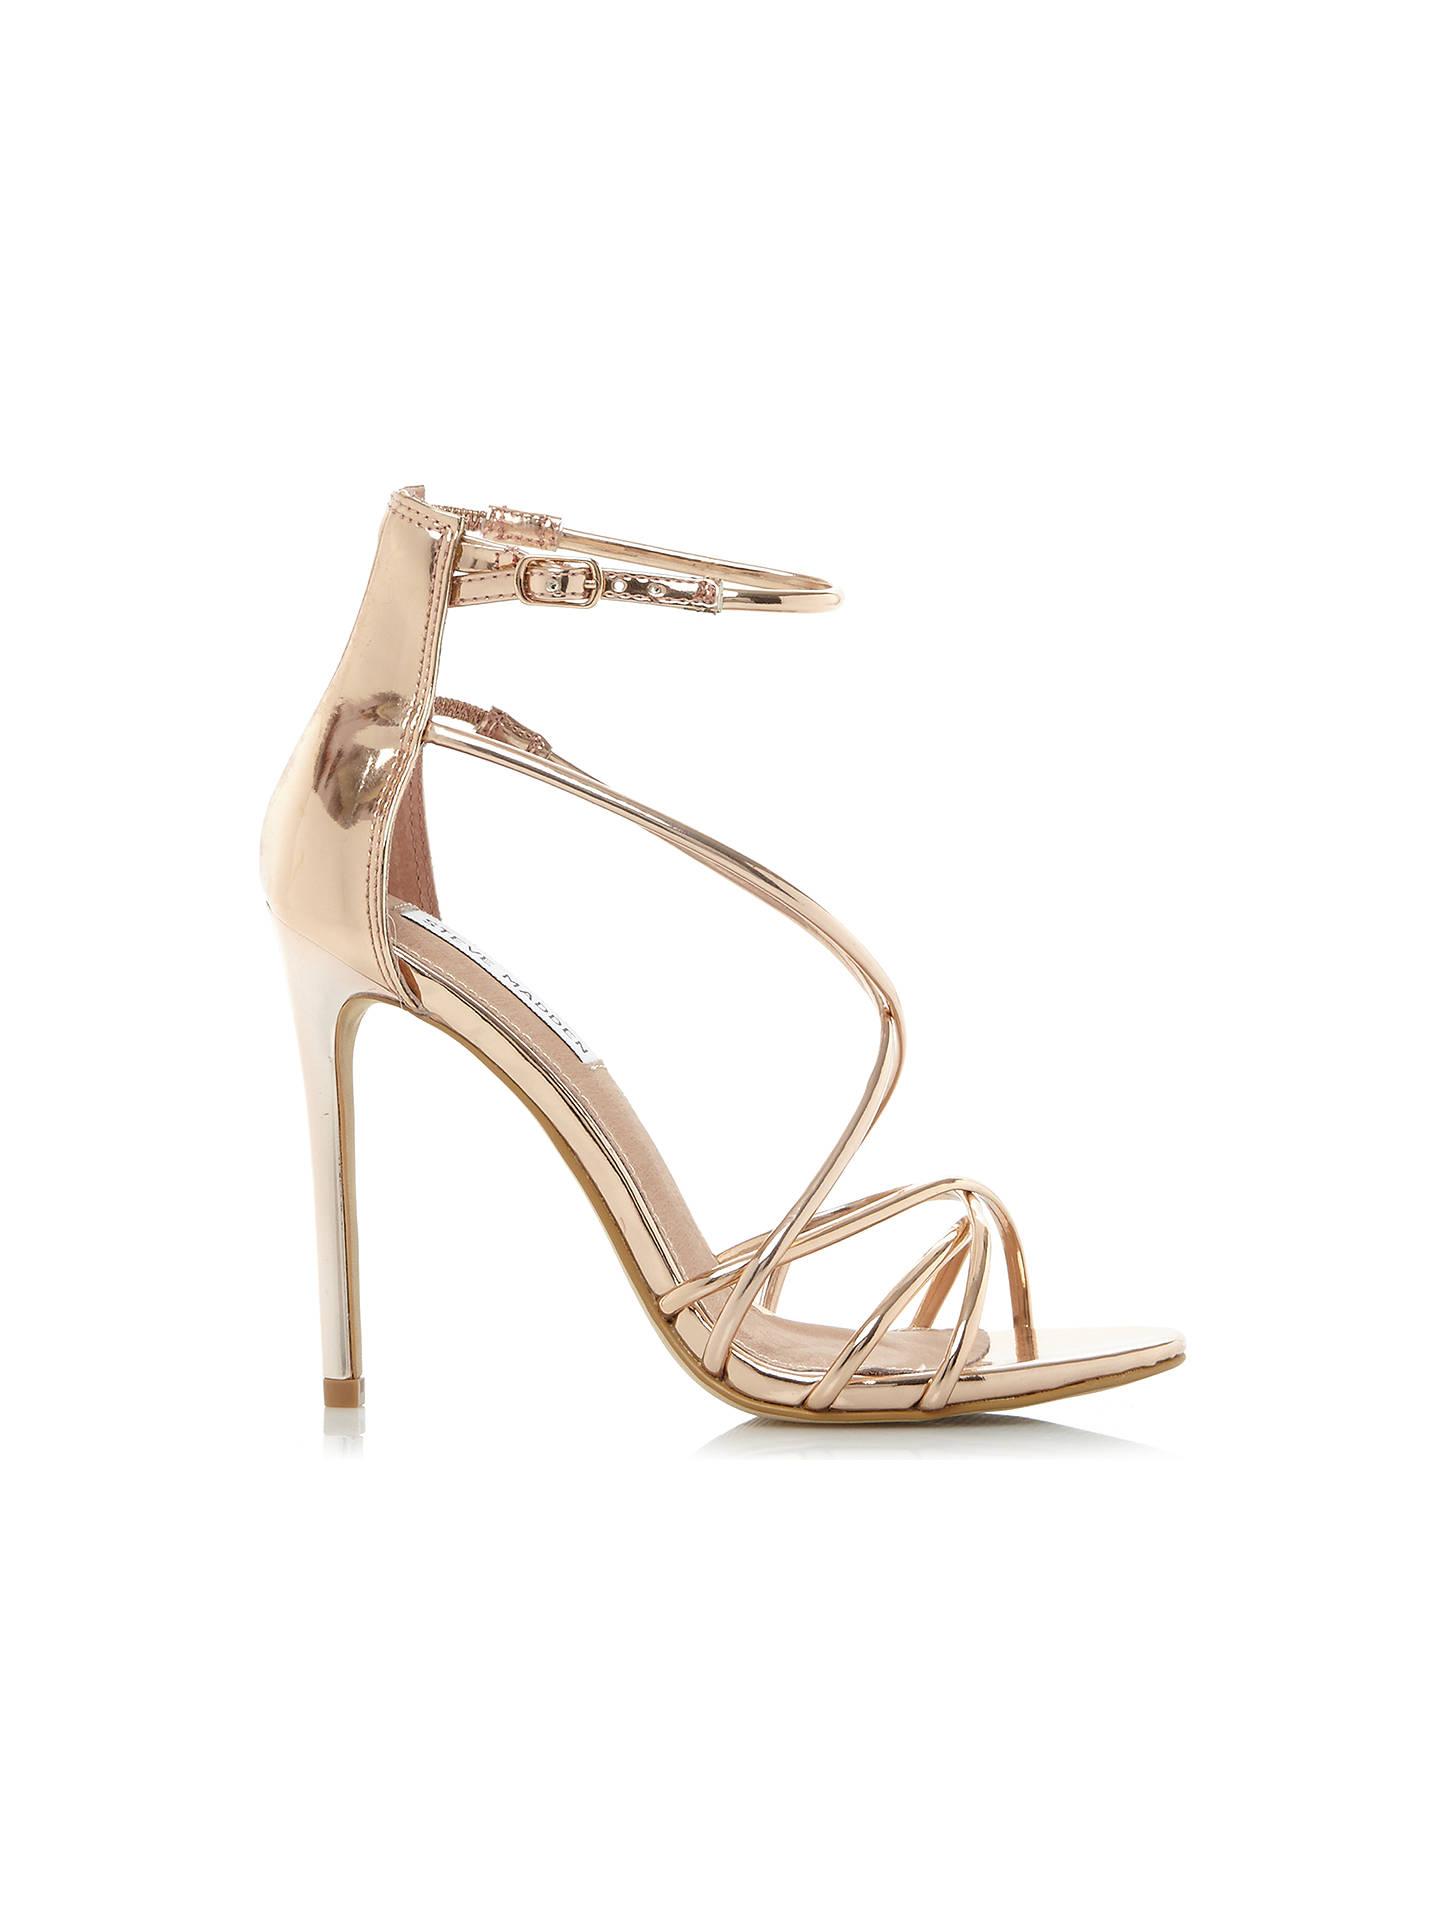 1b11431d0b3 Steve Madden Satire Strappy Stiletto Heeled Sandals at John Lewis ...